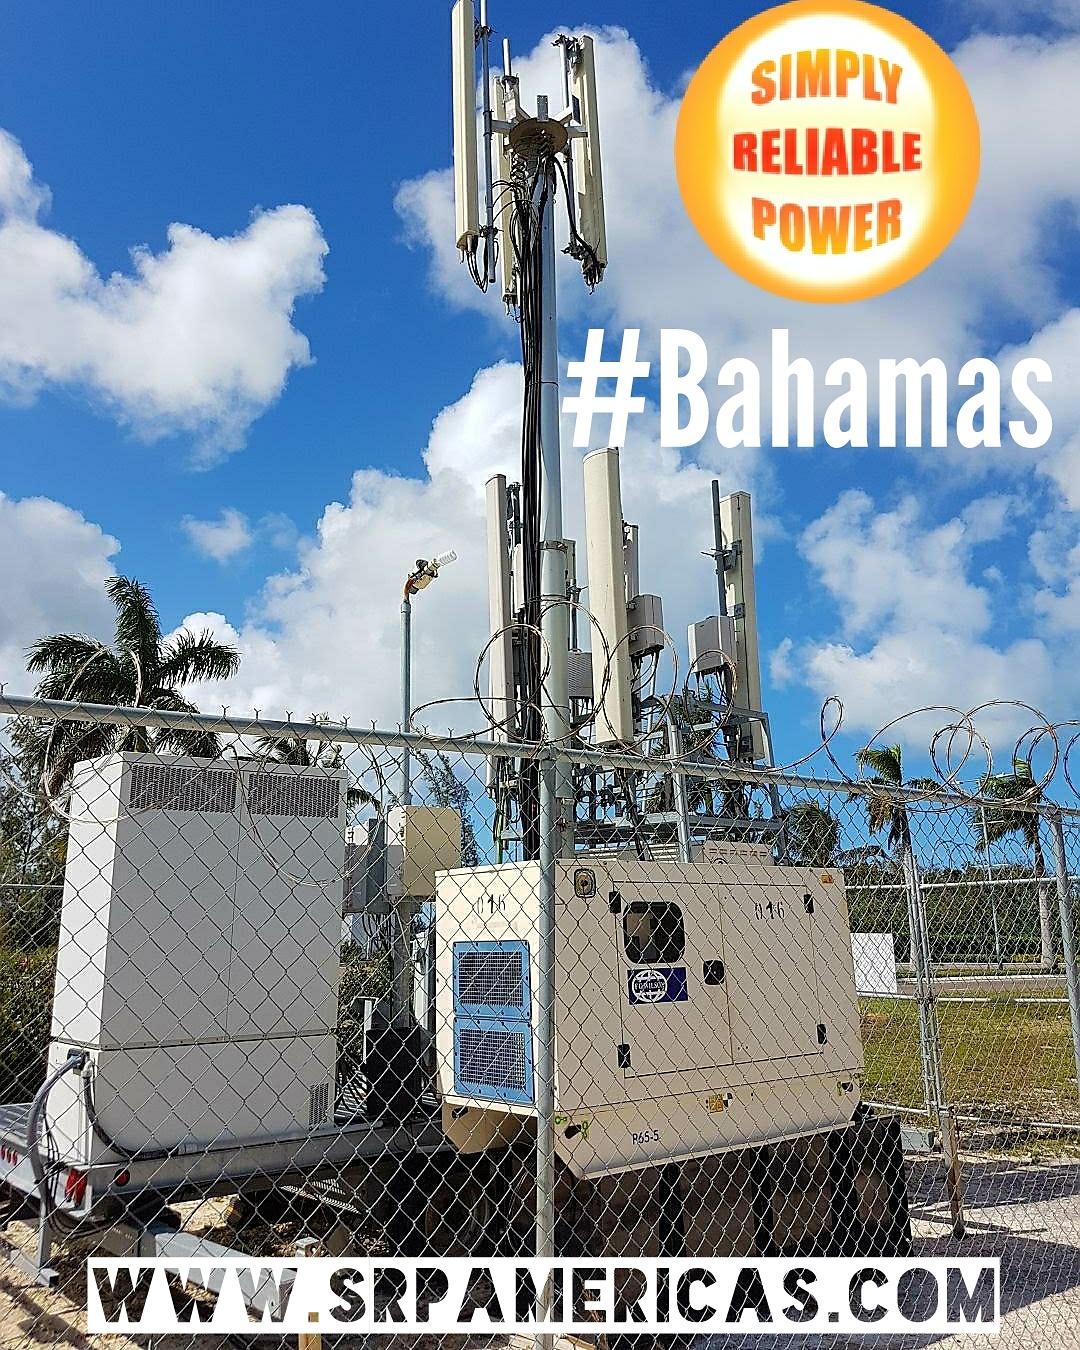 FG Wilson Generators powering a Telecom tower